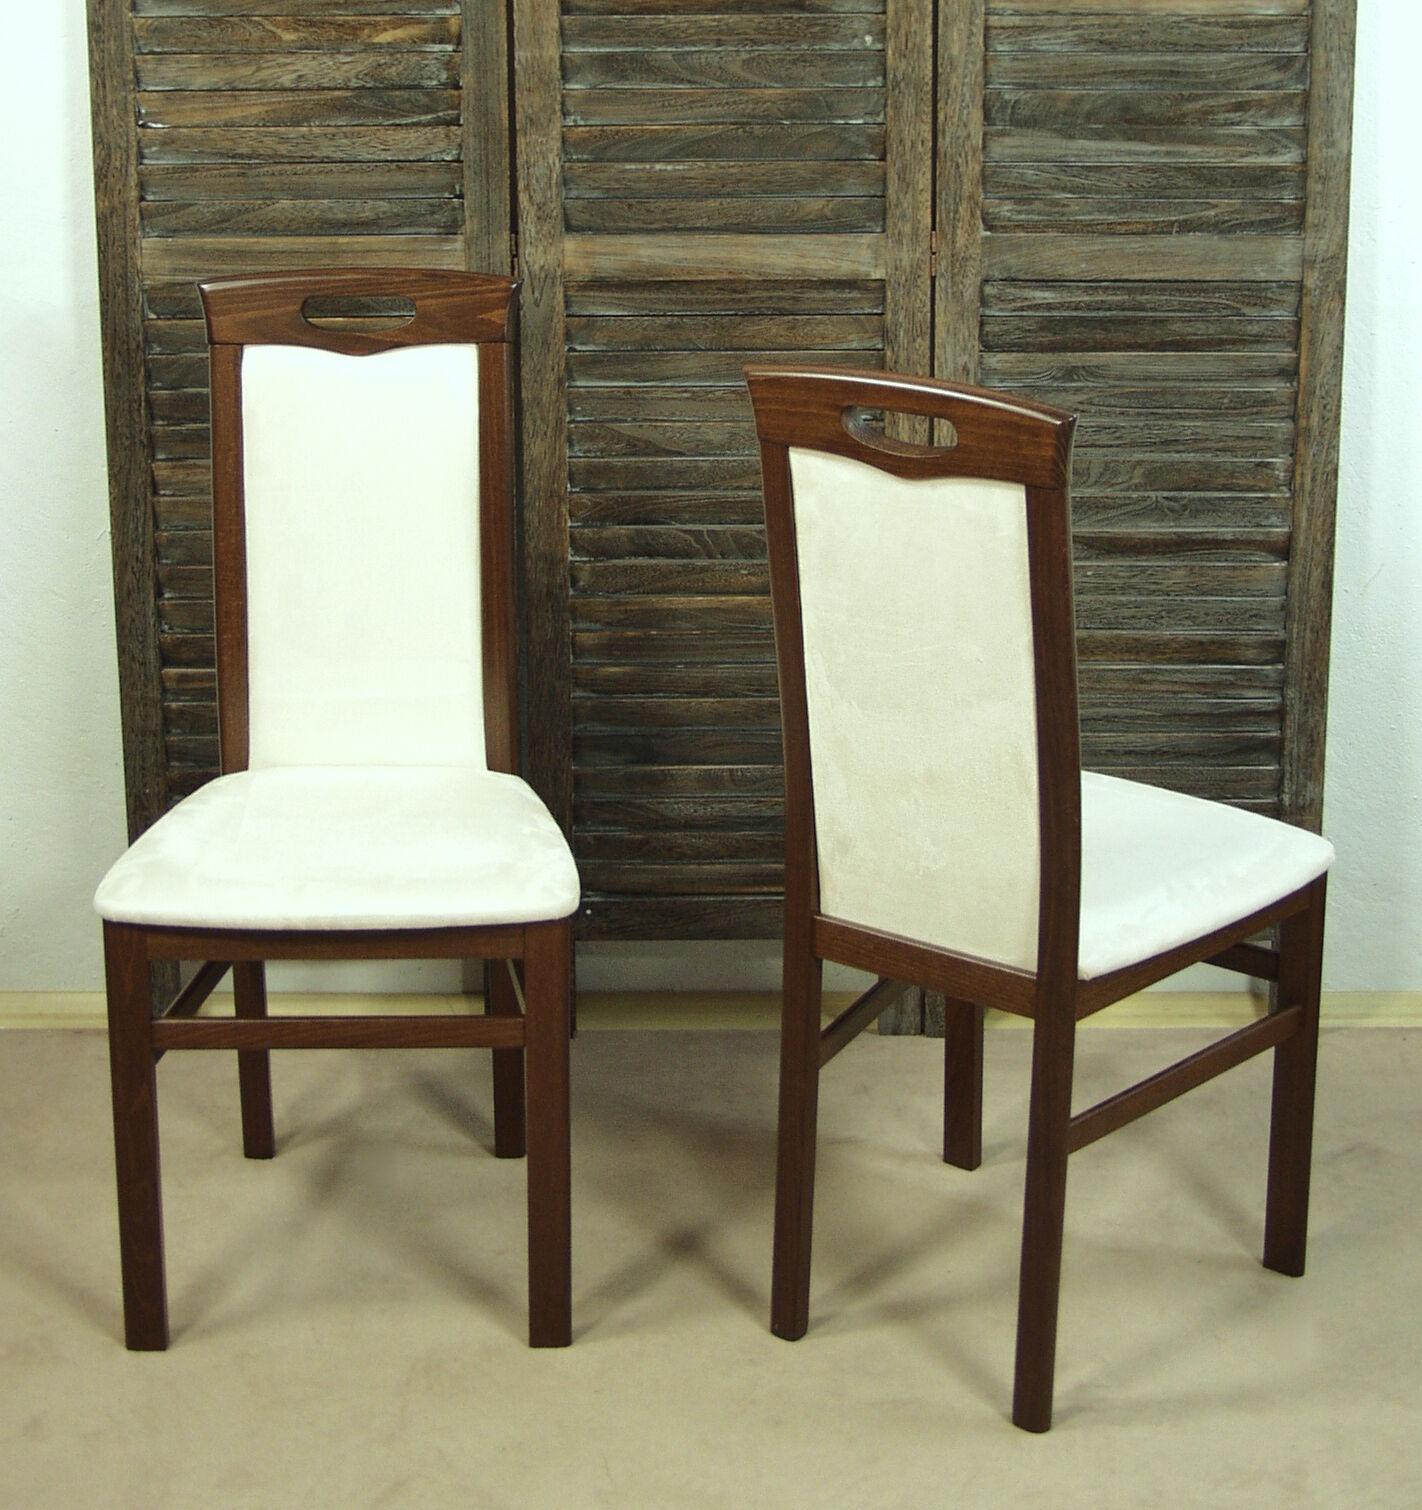 2 X Stuhle Massivholz Esszimmerstuhle Stuhlset Esszimmer Nussbaum